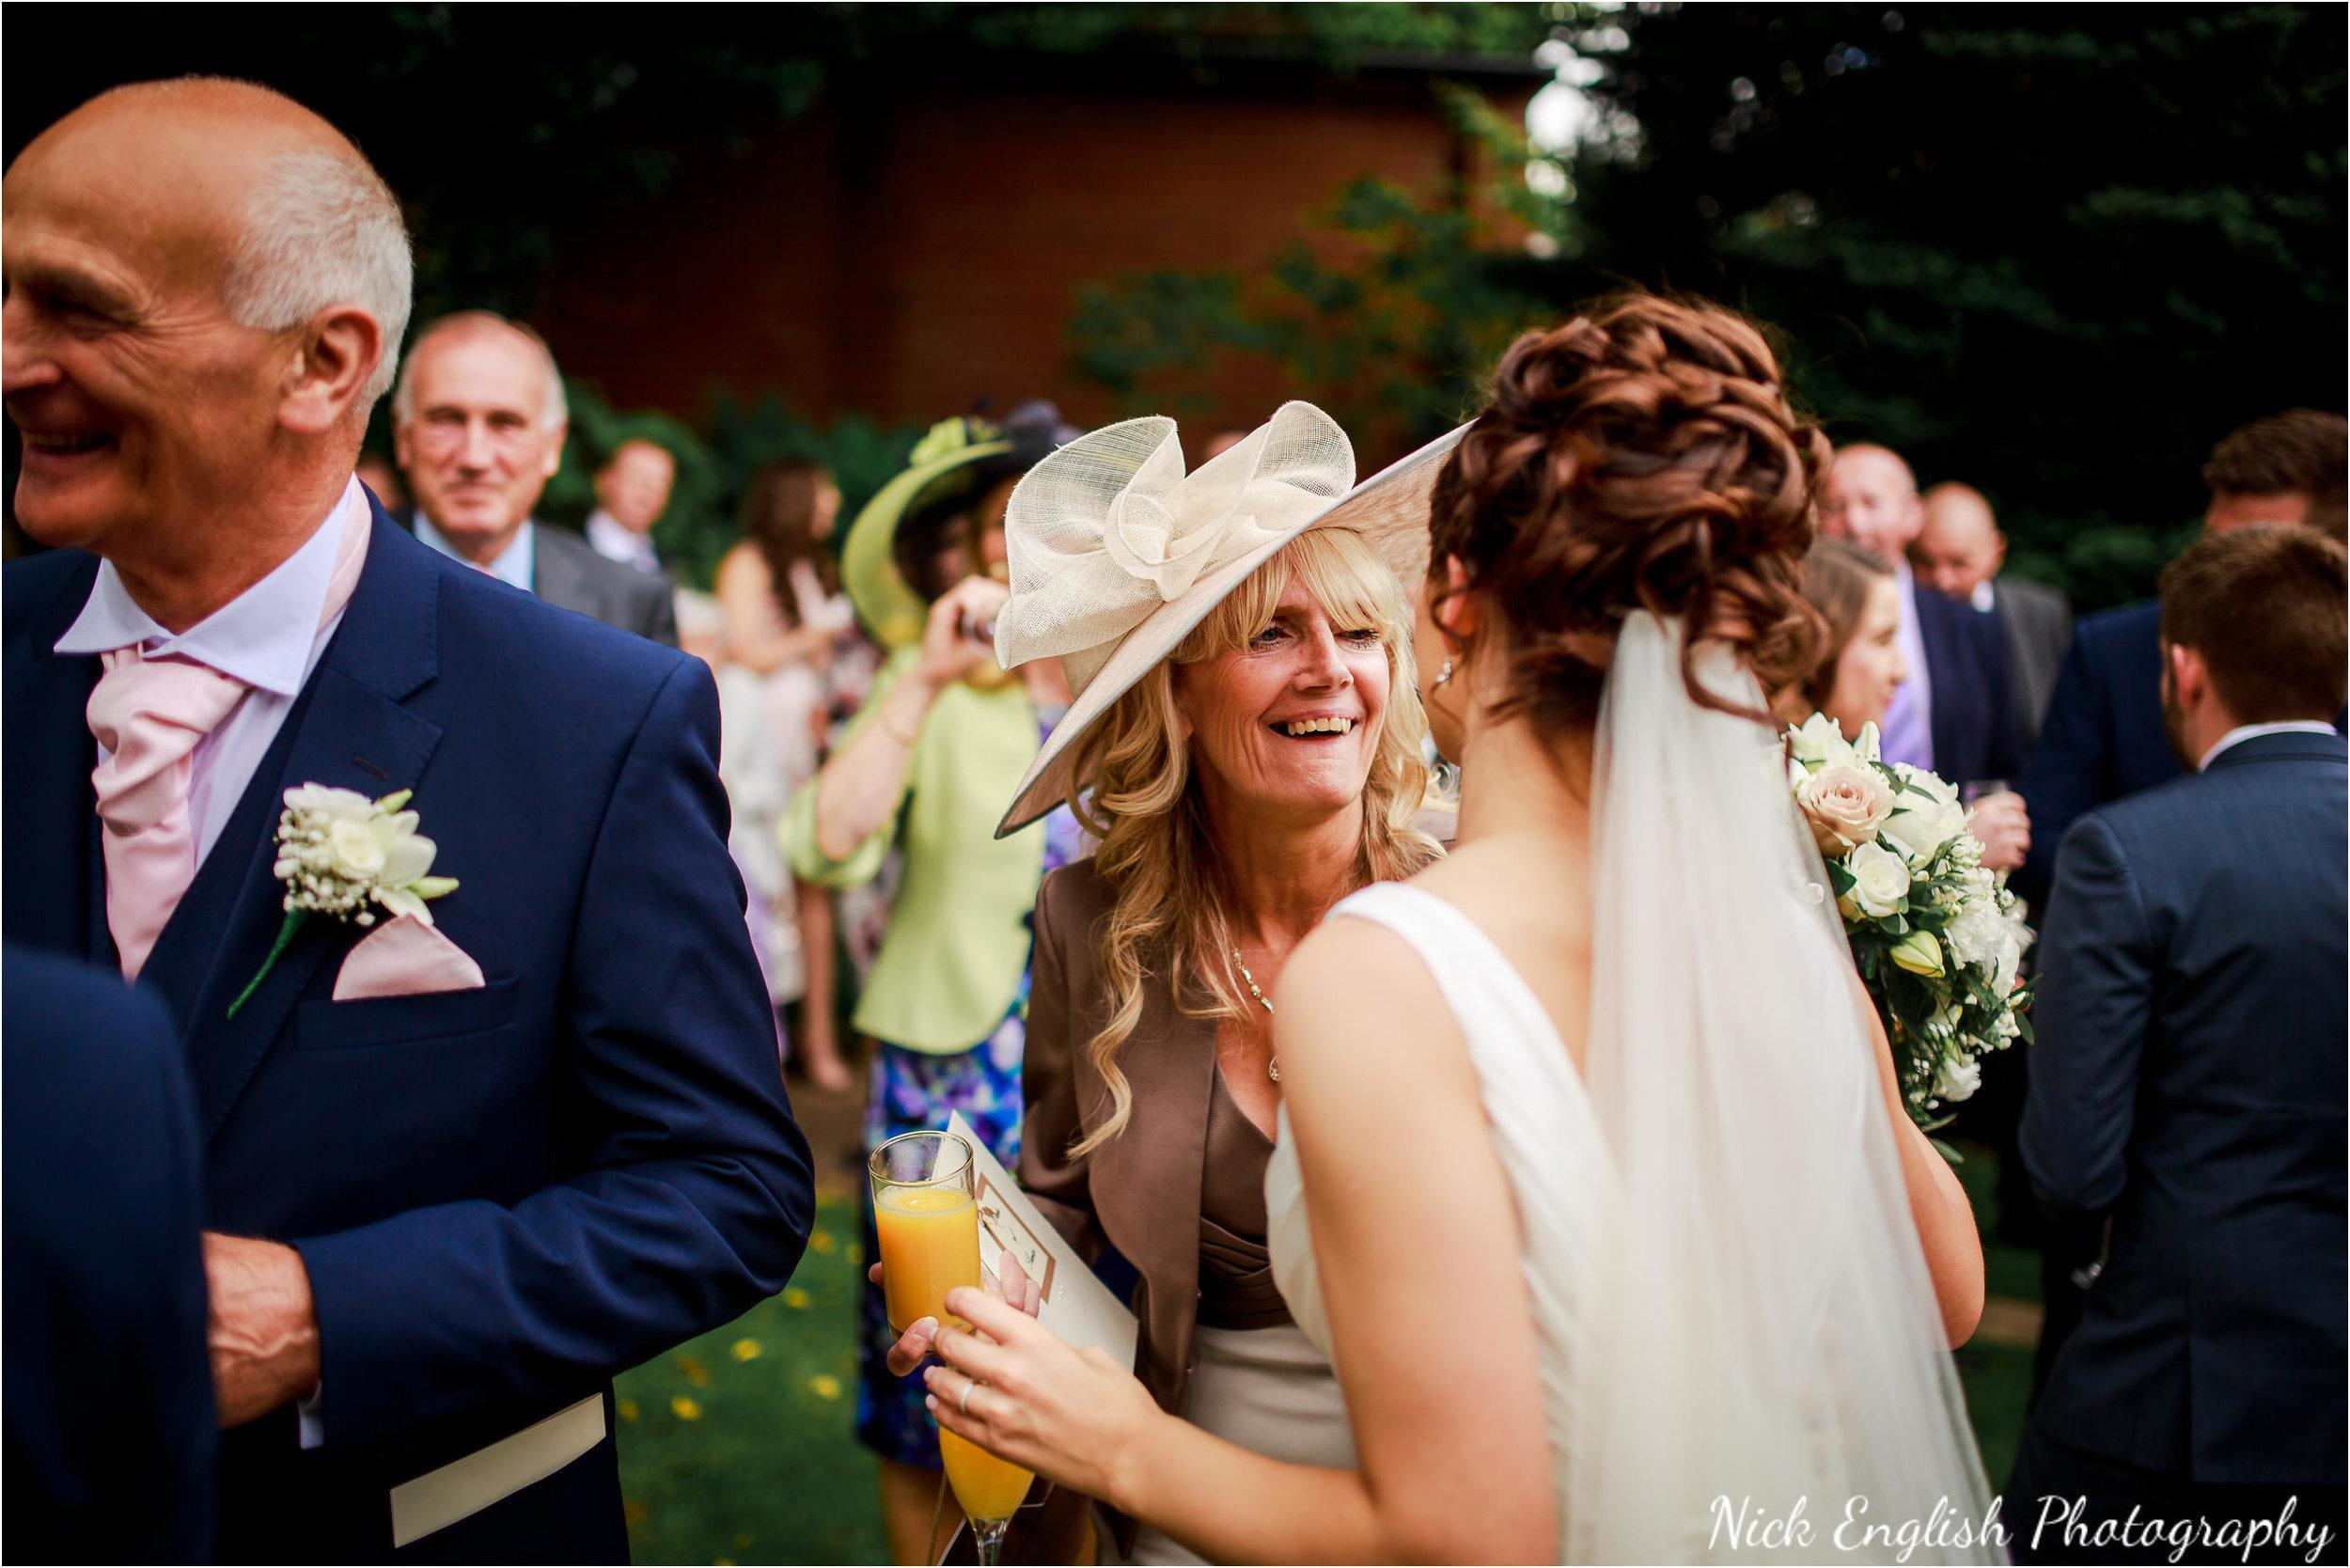 Emily David Wedding Photographs at Barton Grange Preston by Nick English Photography 100jpg.jpeg